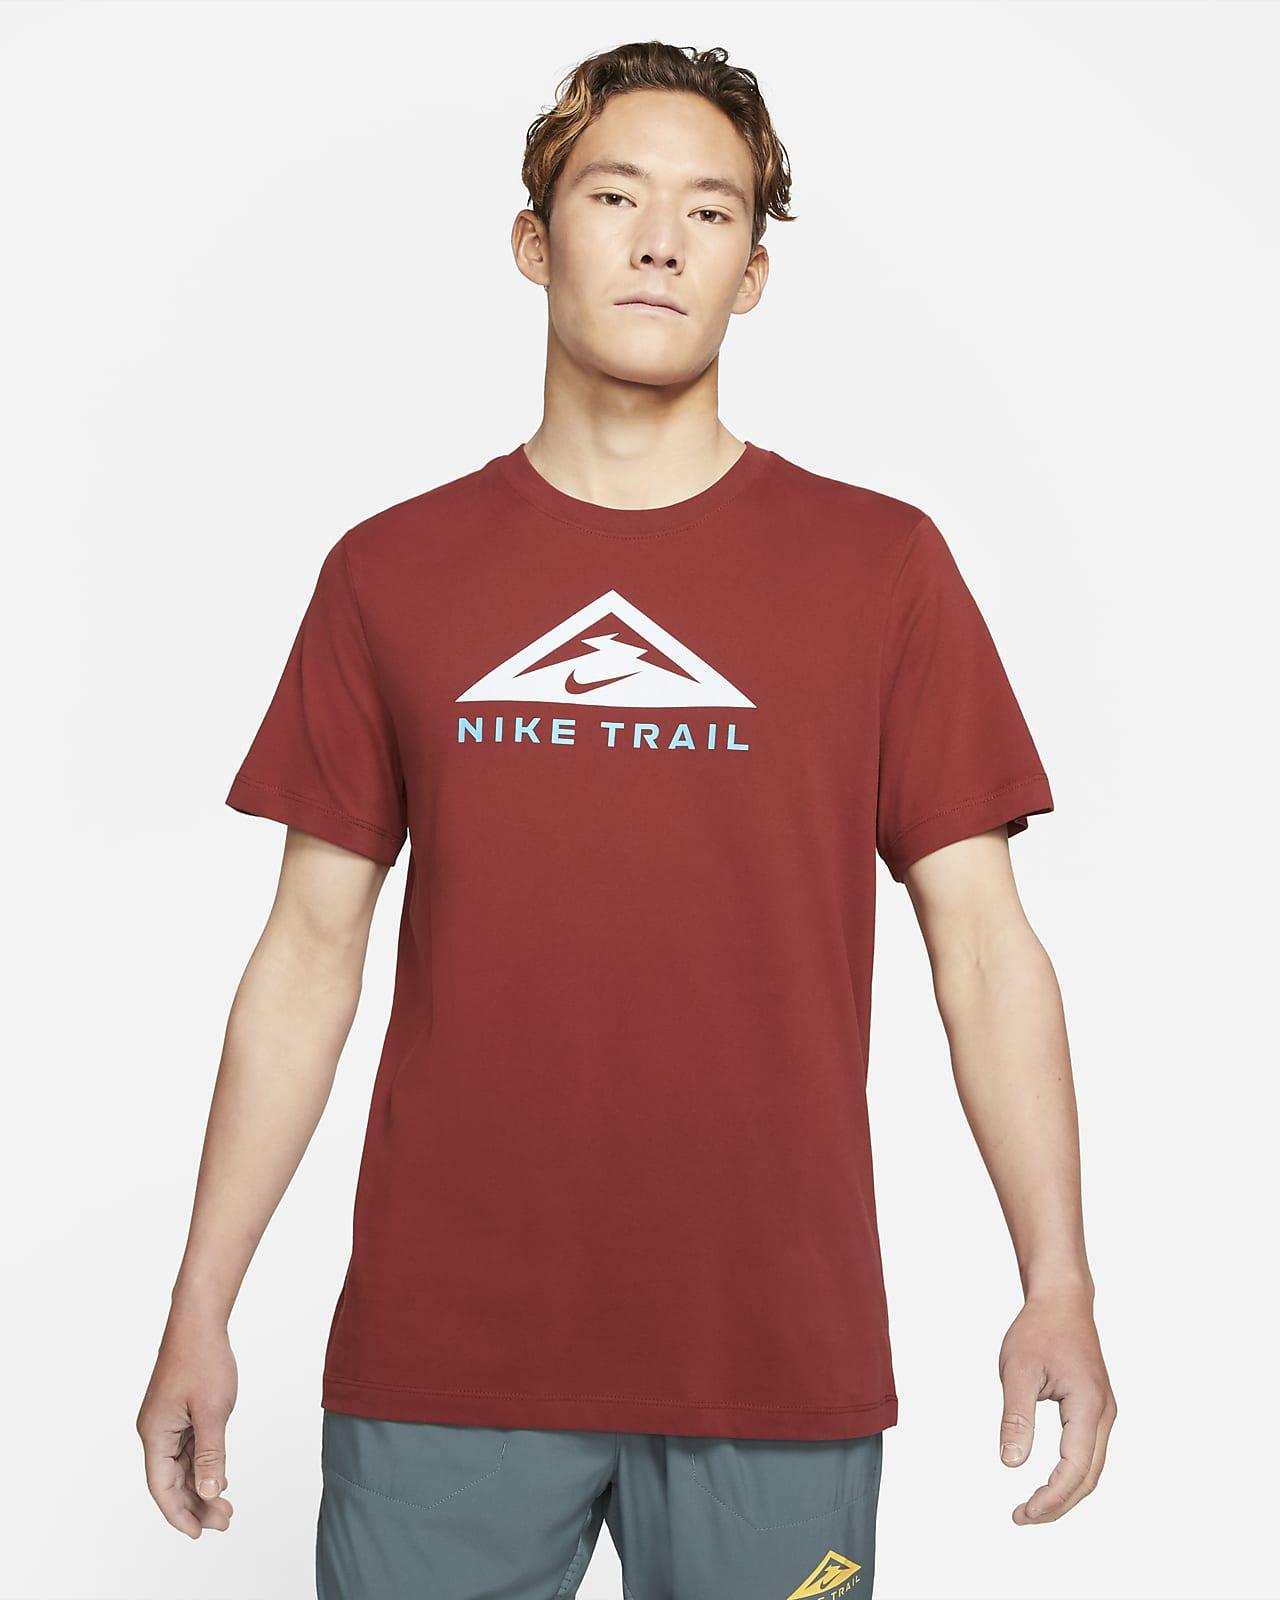 Playera de trail running de manga corta Nike Dri-FIT